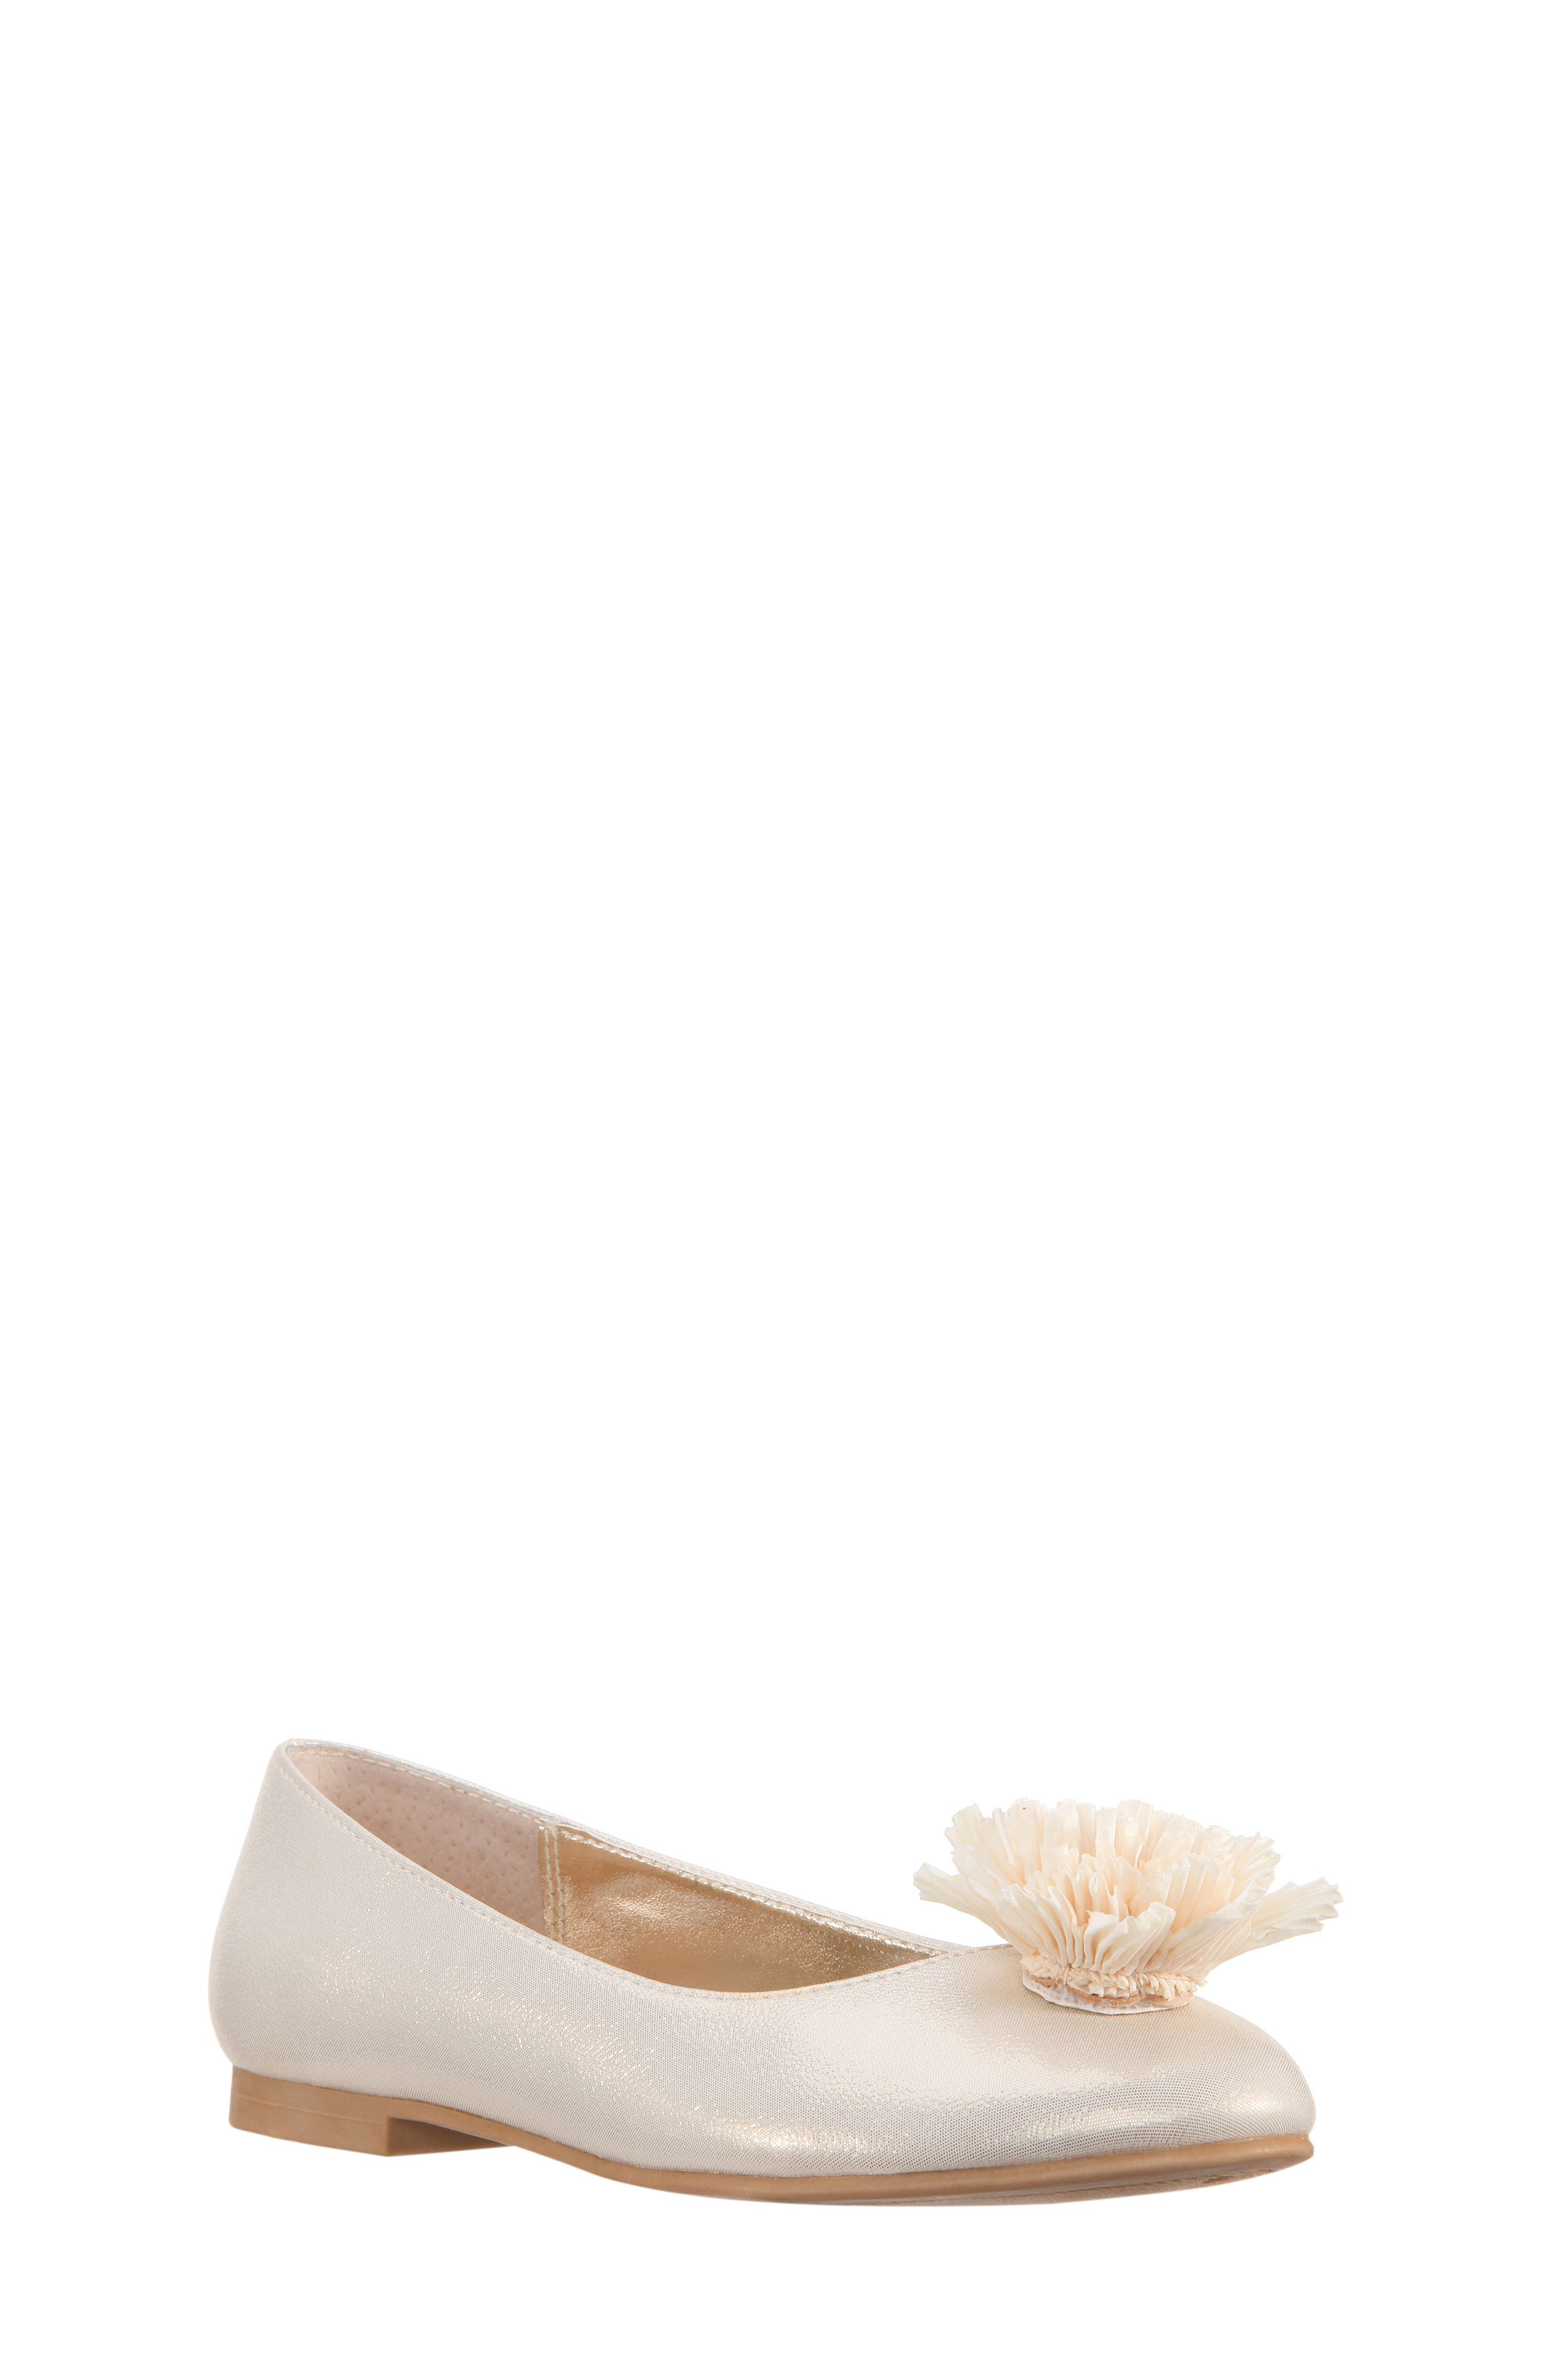 Jemma Flower Ballet Flat,                             Main thumbnail 1, color,                             Platino Metallic